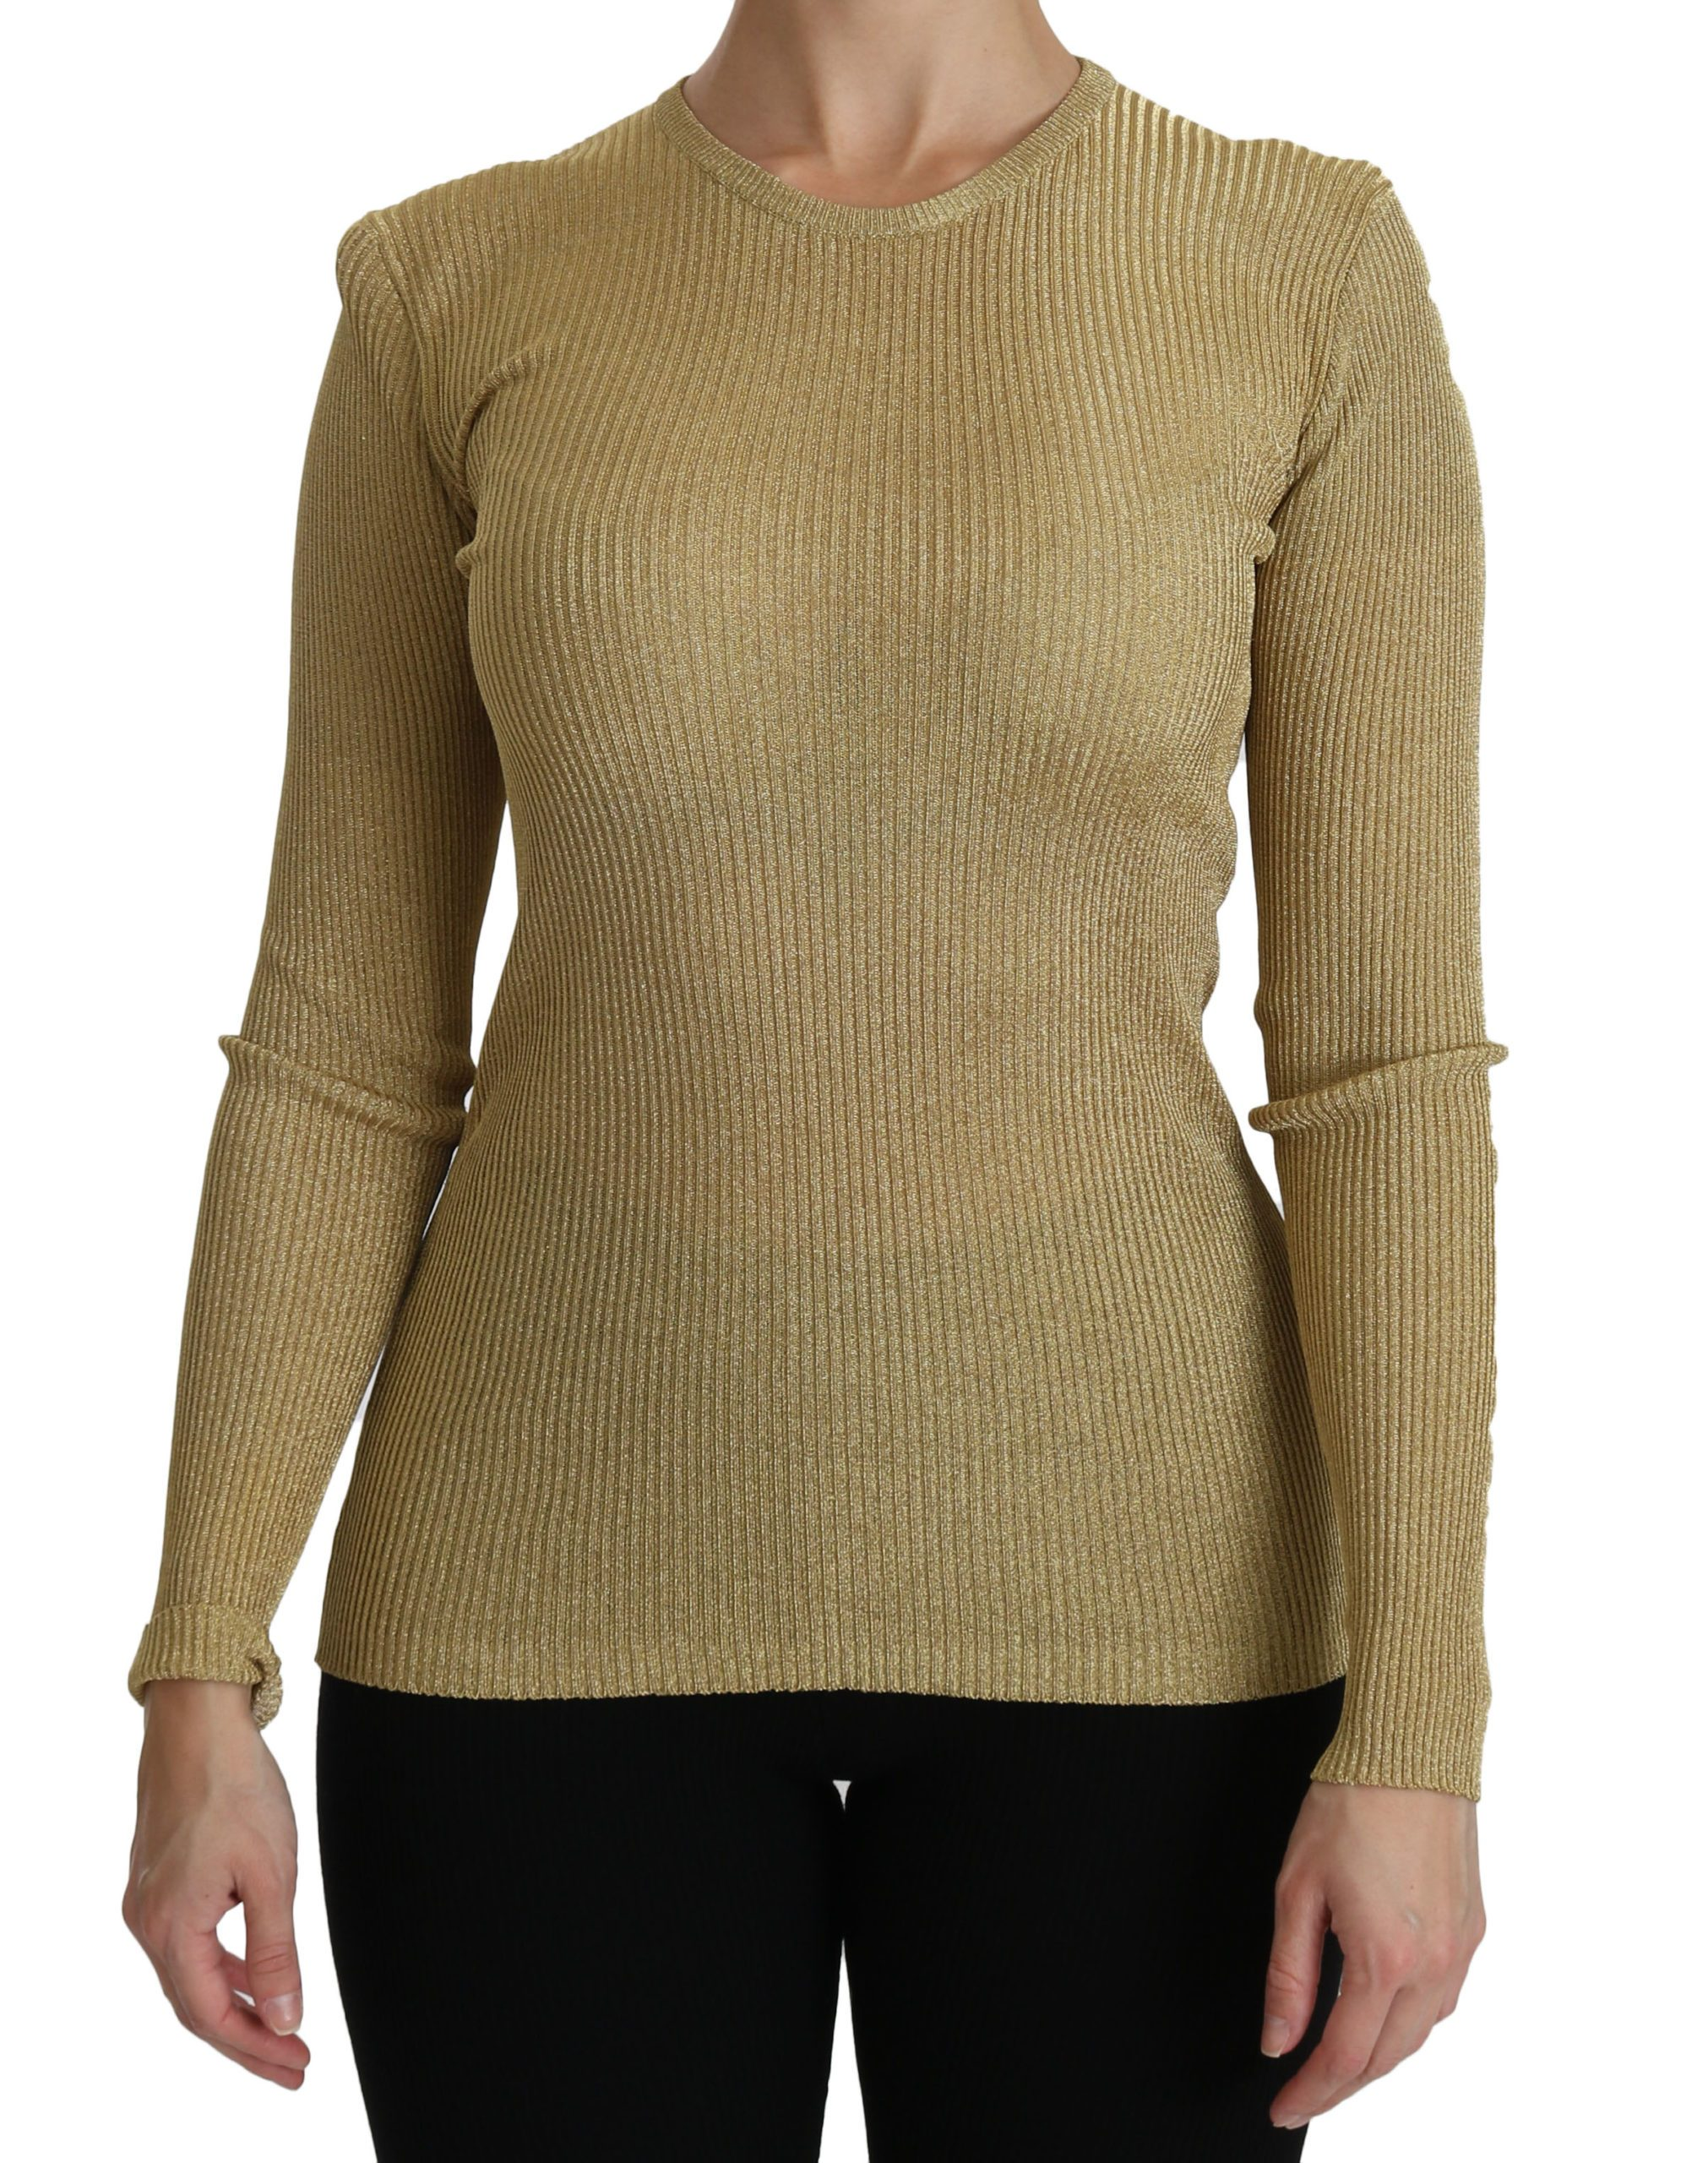 Dolce & Gabbana Women's Crew Neck LS Viscose Top Gold TSH4242 - IT40 S